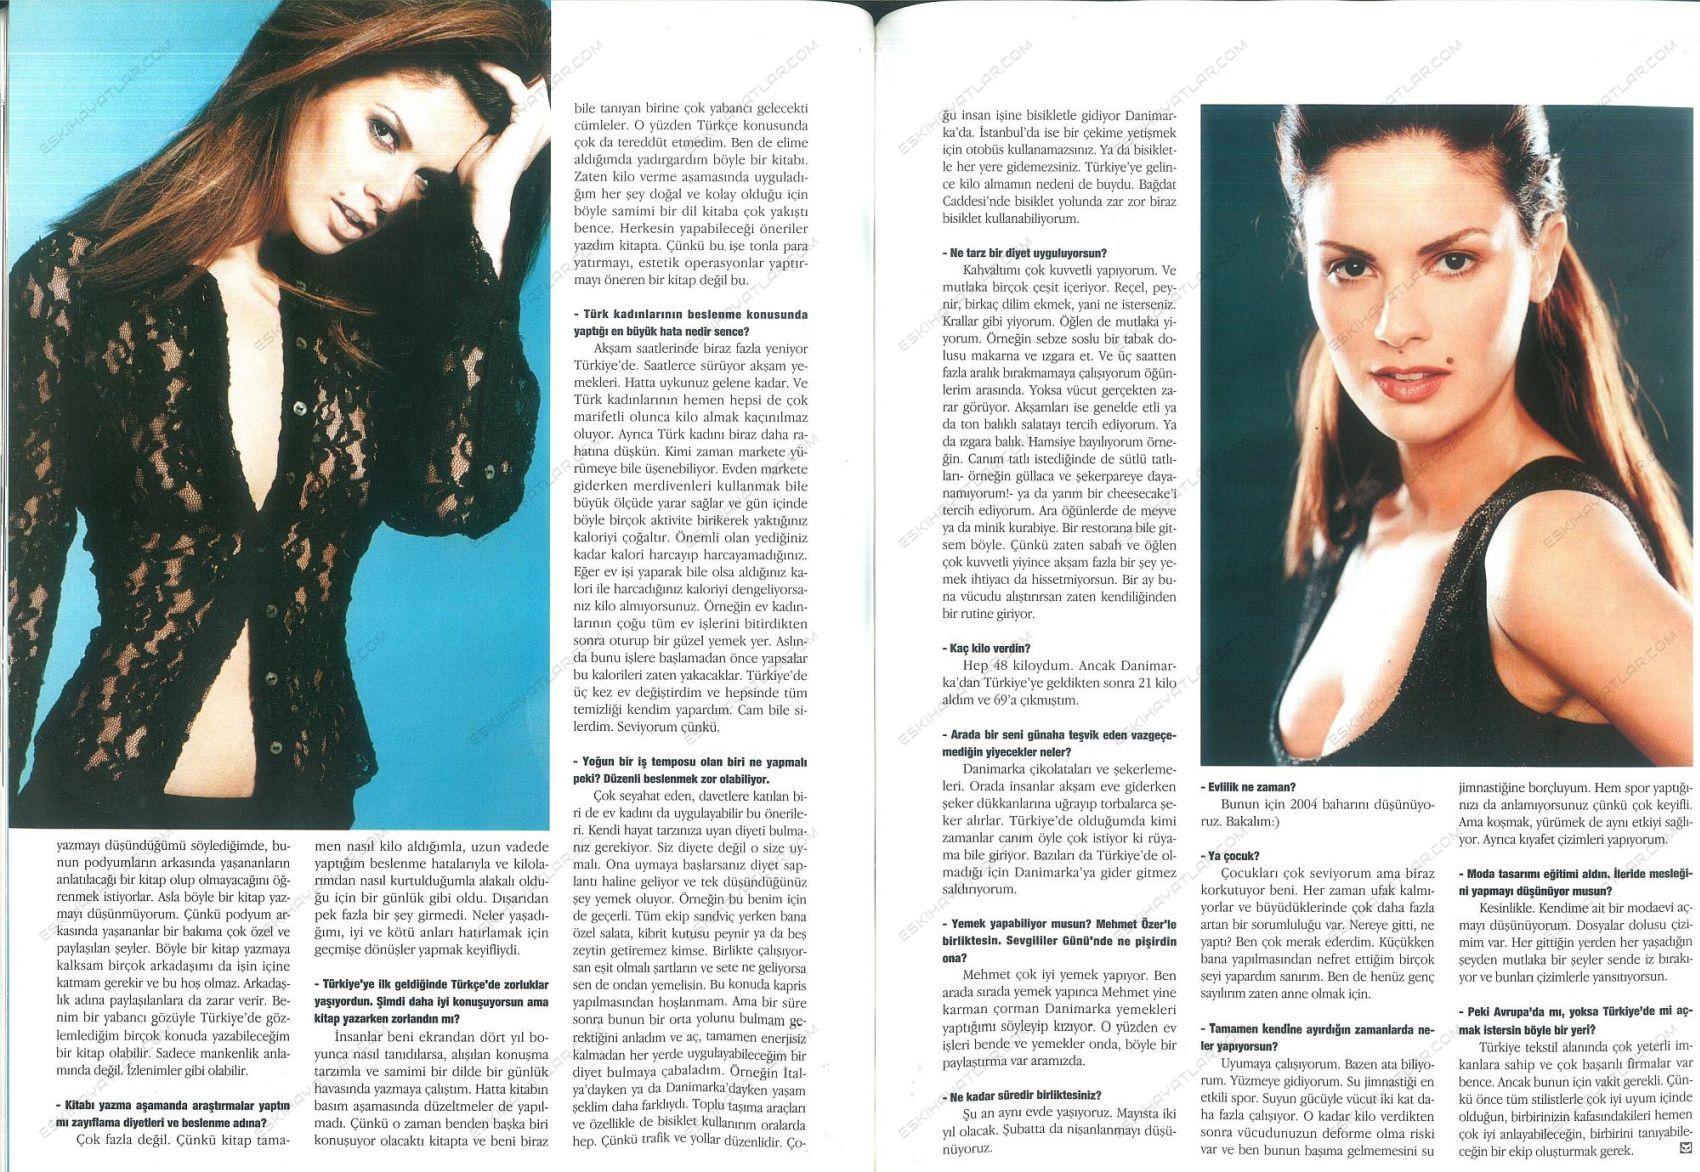 0372-tulin-sahin-fotograflari-sivasli-cindy-kimdir-2003-cosmopolitan-dergisi (2)